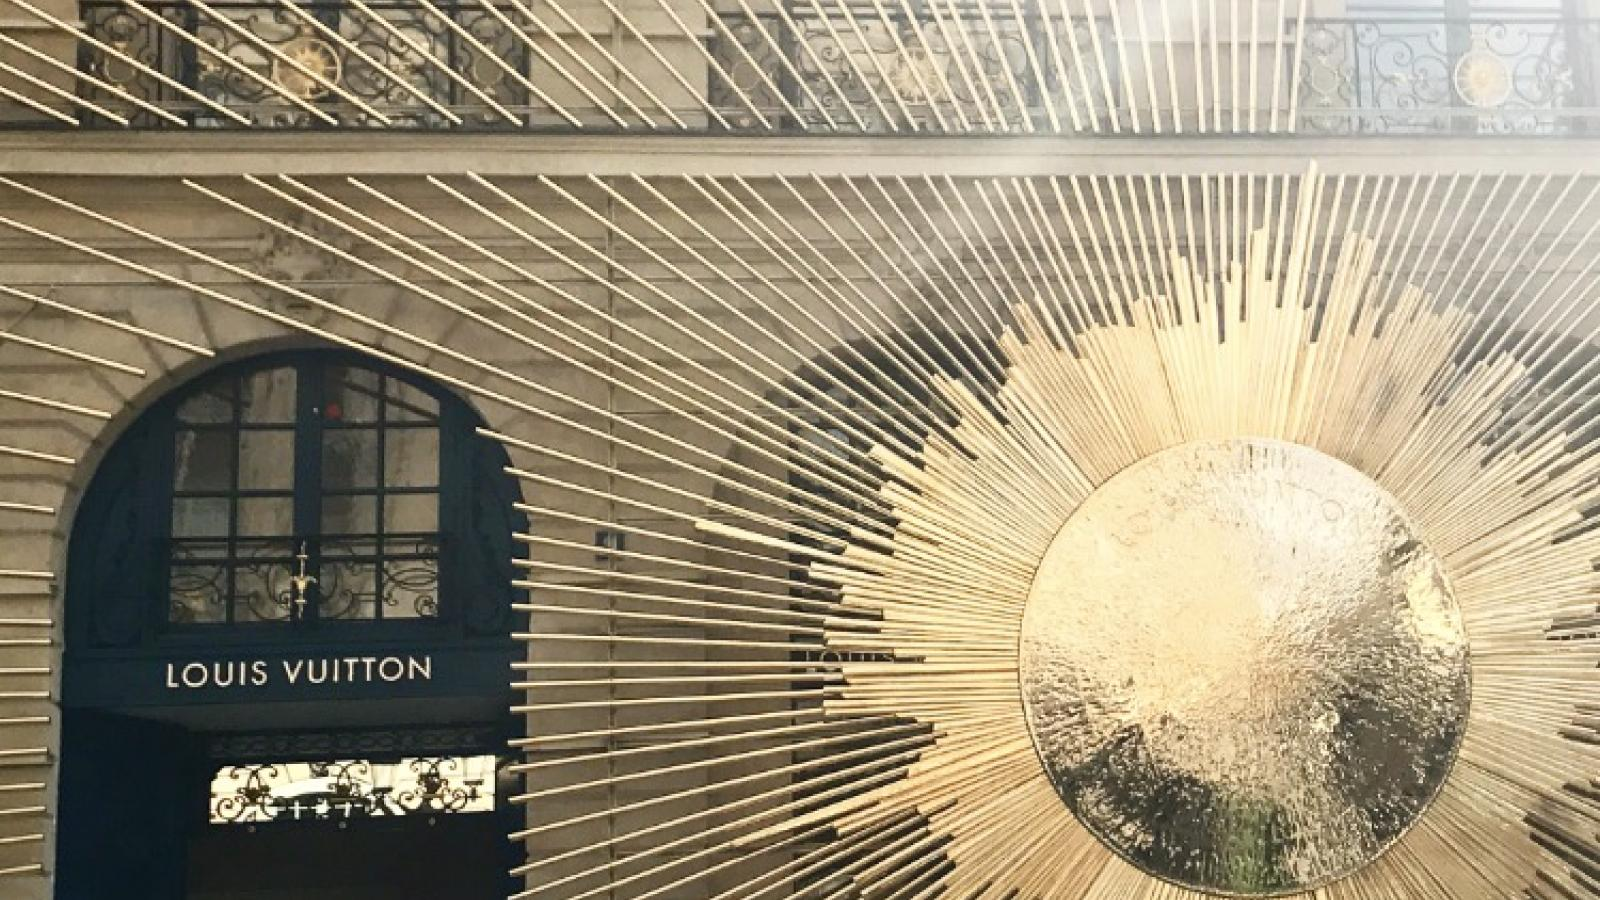 A new Louis Vuitton boutique near the Roch Hotel